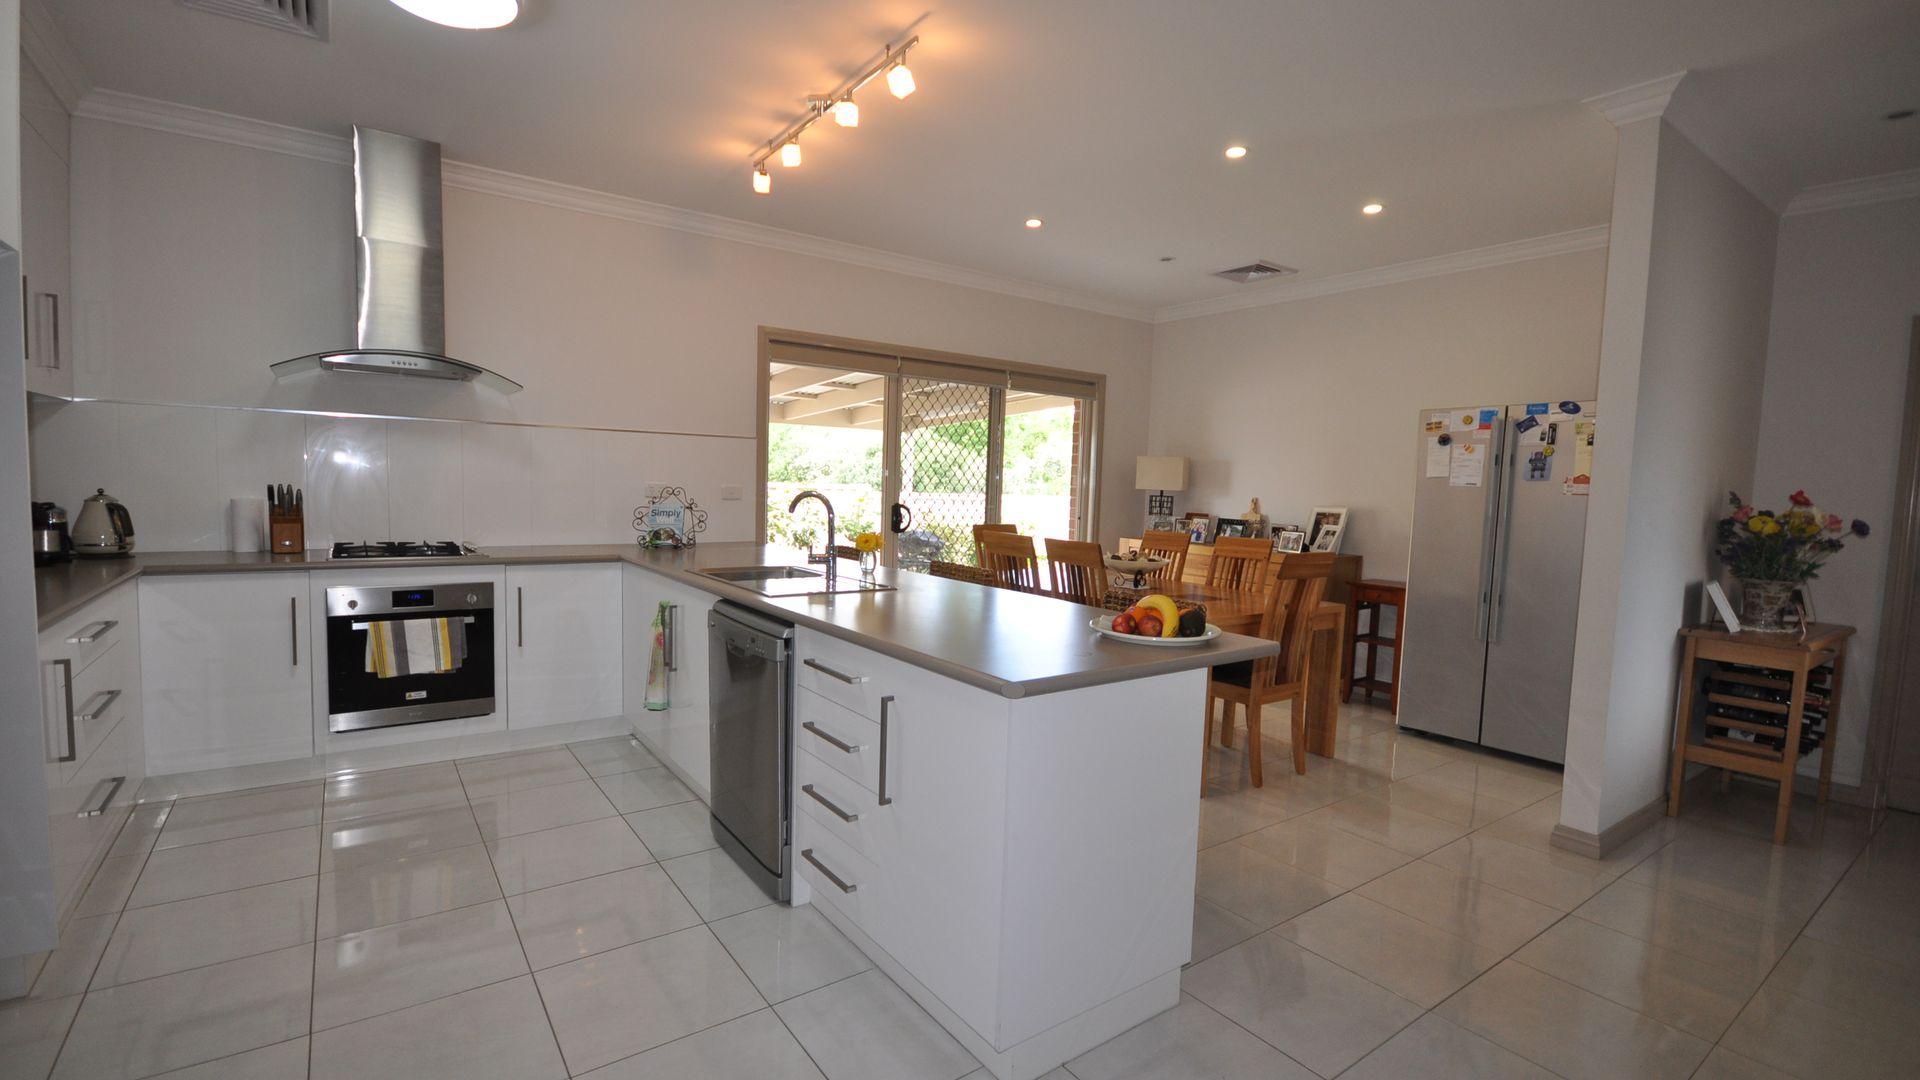 3/483 Schubach Street, East Albury NSW 2640, Image 2